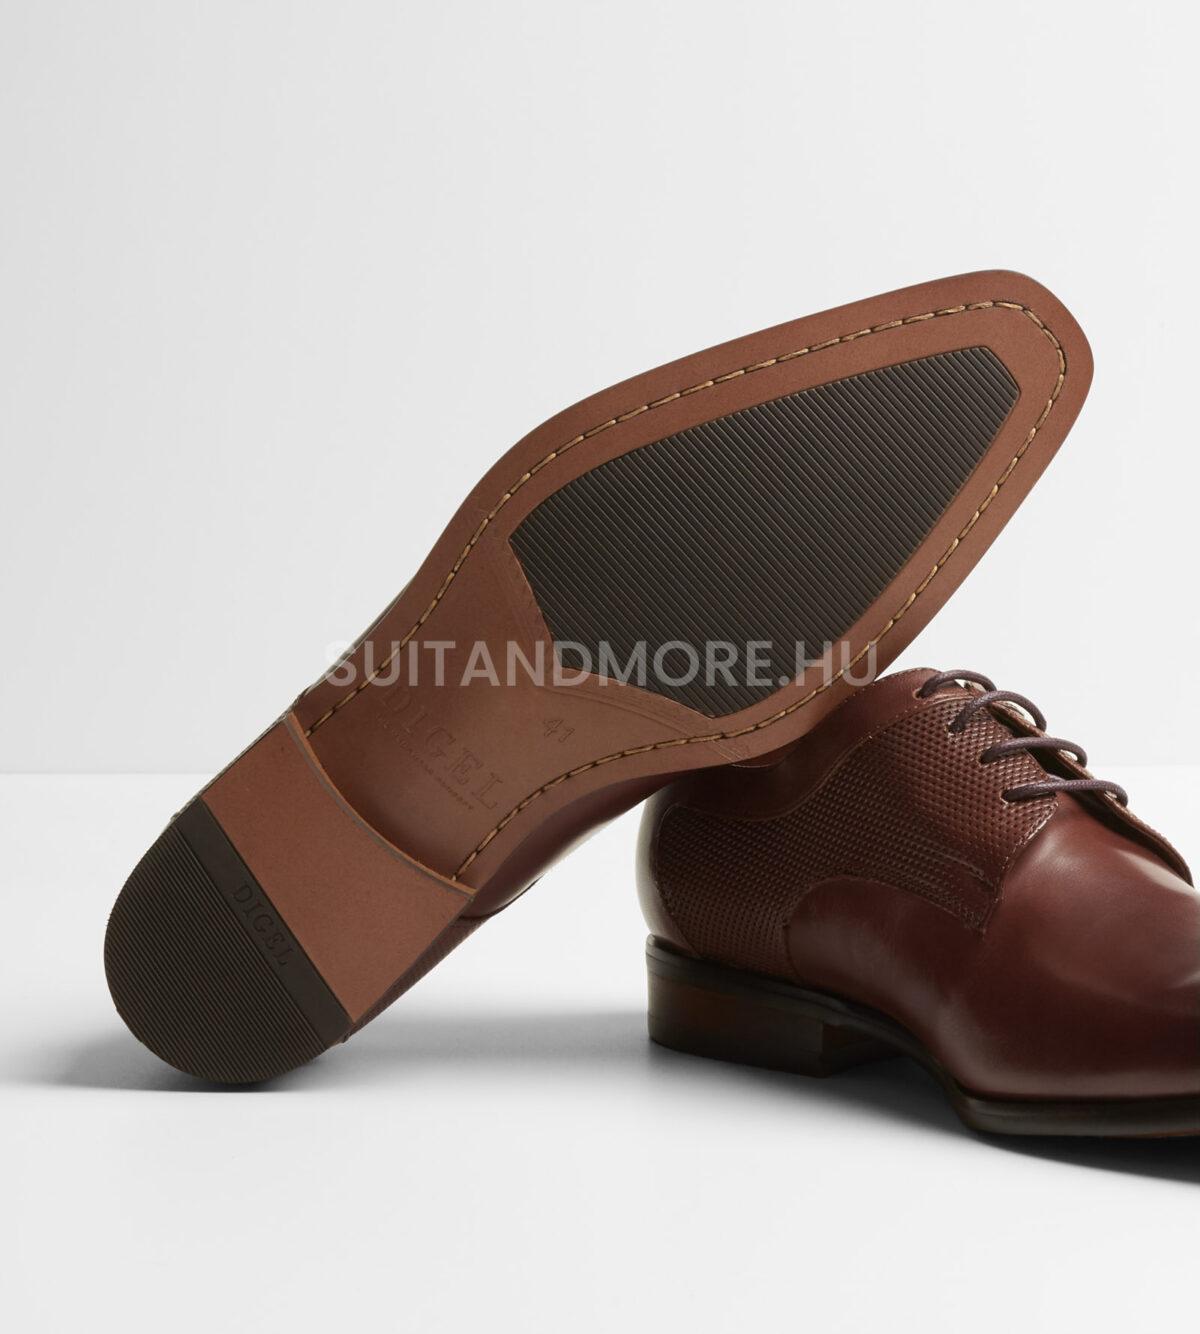 DIGEL-középbarna-fűzős-derby-cipő-SYRAKUS-1001907-32-03